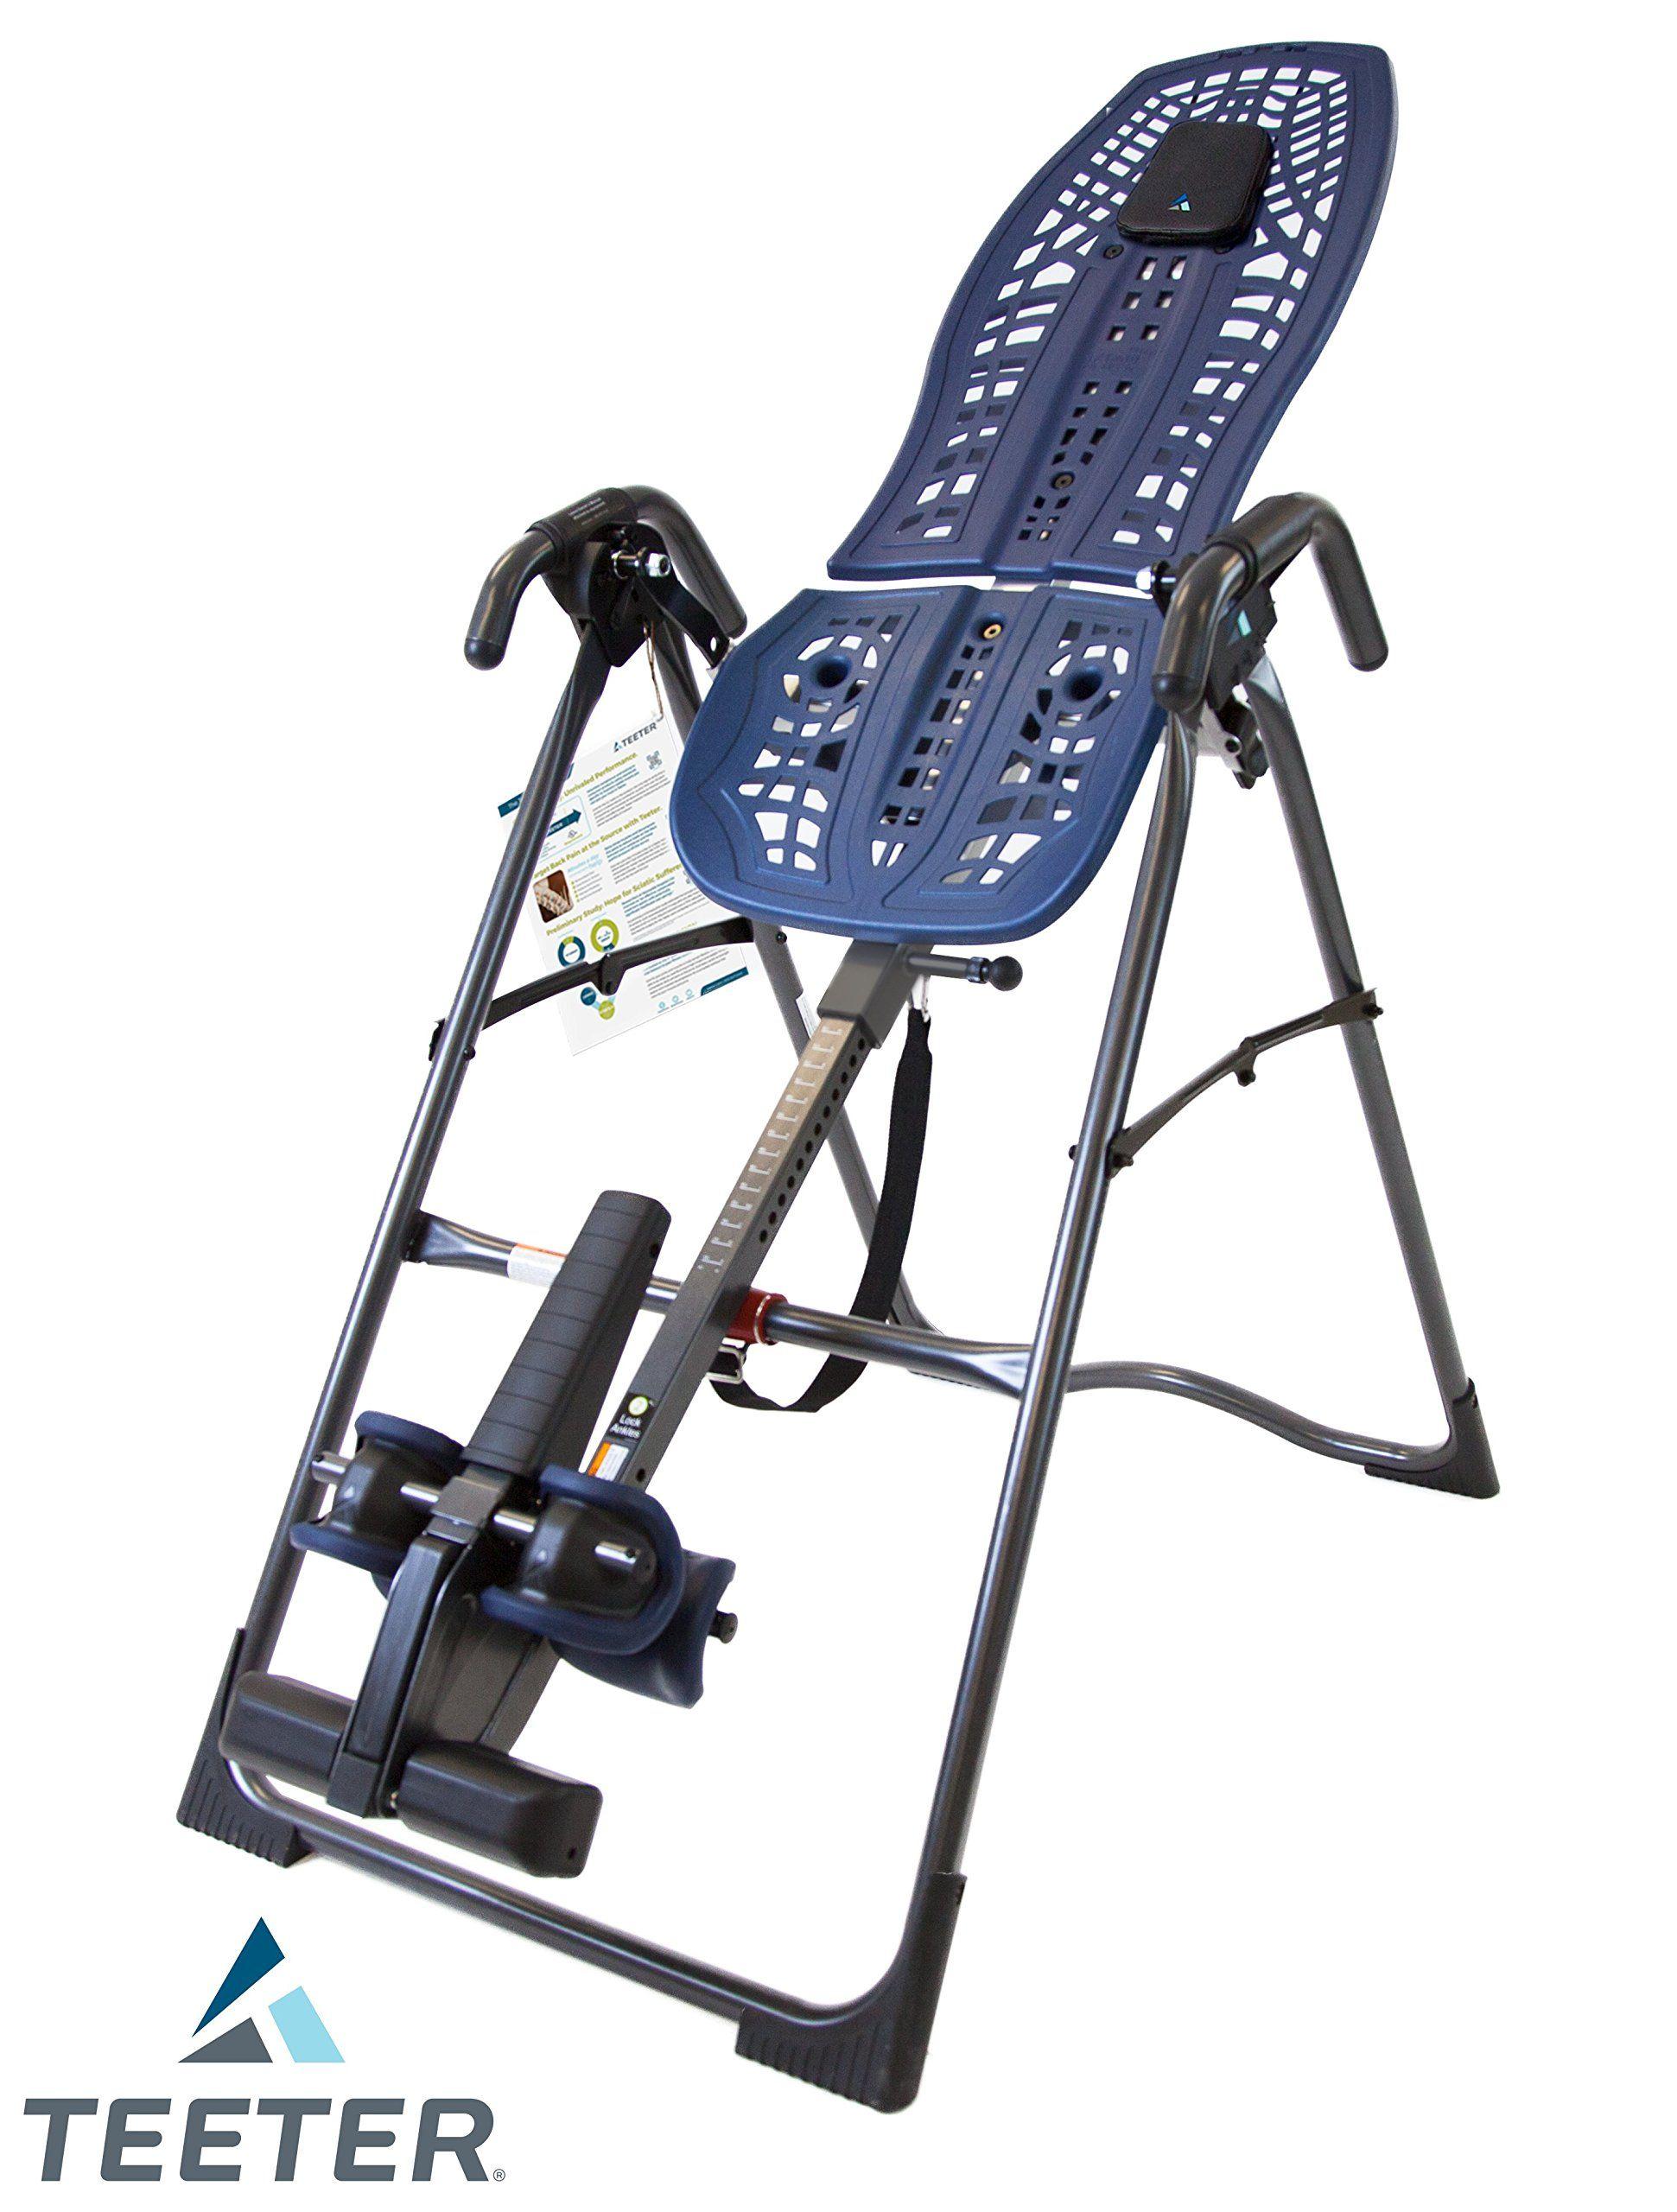 Teeter Ia1009 Invertalign 900 Inversion Table Blue Black Ez